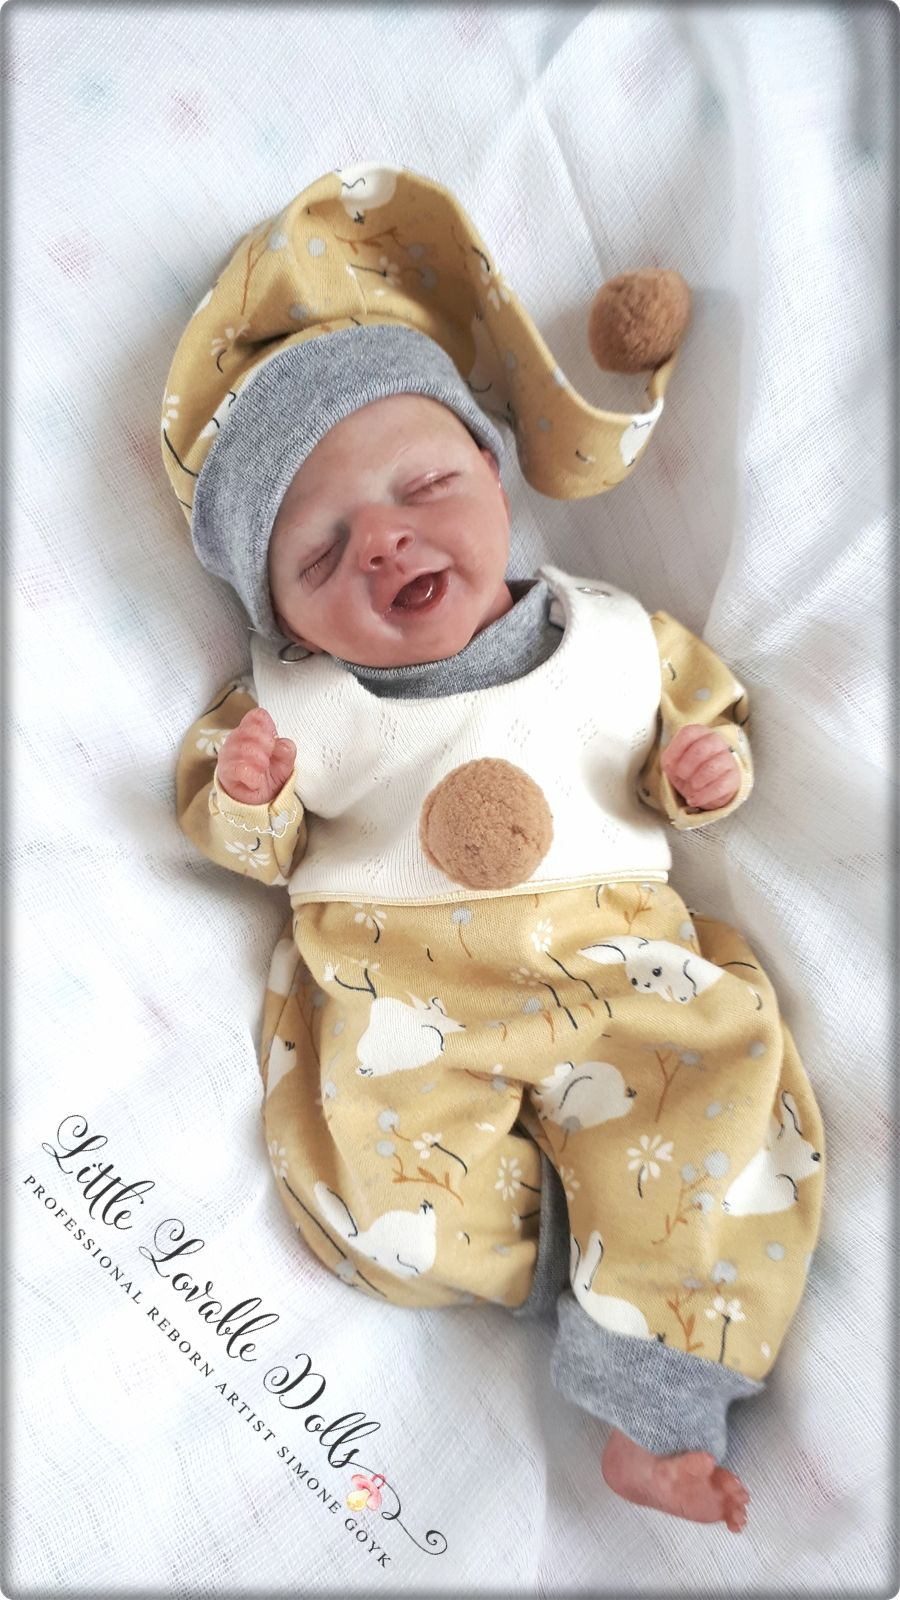 Mini Reborn Baby Salia Bausatz Olga Auer Reborn Babies Reborn Baby Dolls Baby Dolls